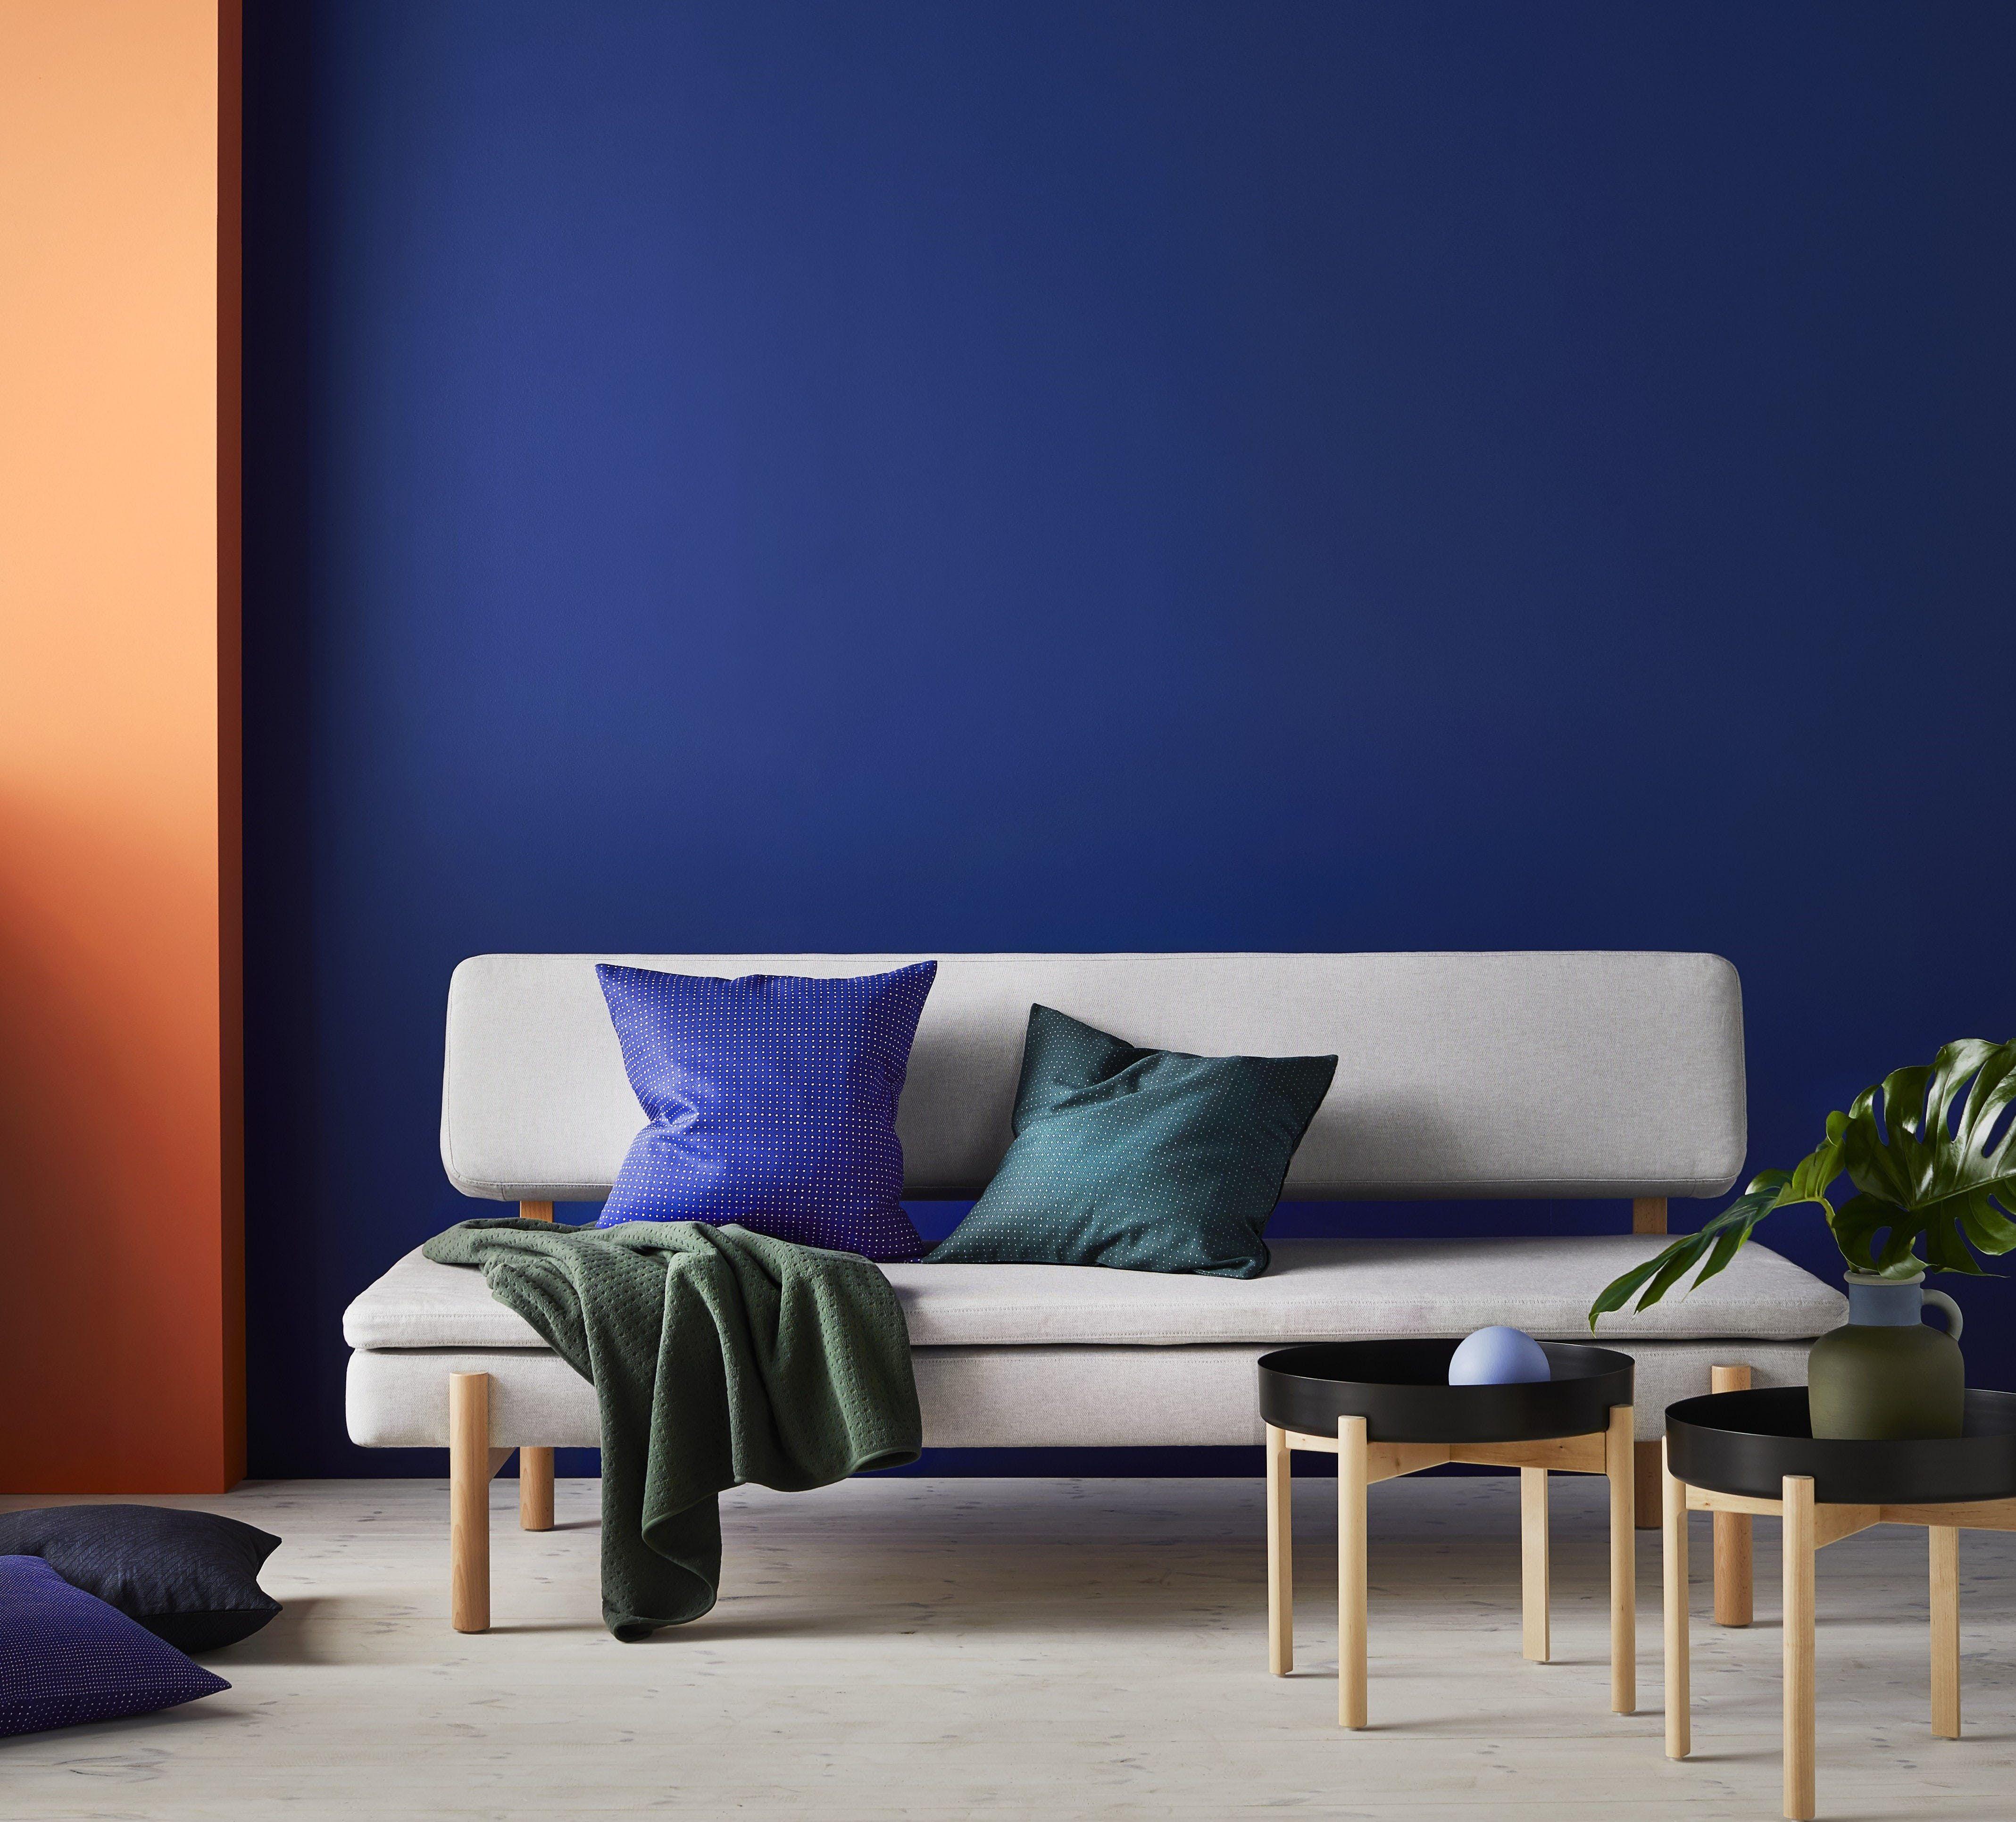 4 Sofa Tie Sandbacken Amp Ypperlig Sofas Top 10